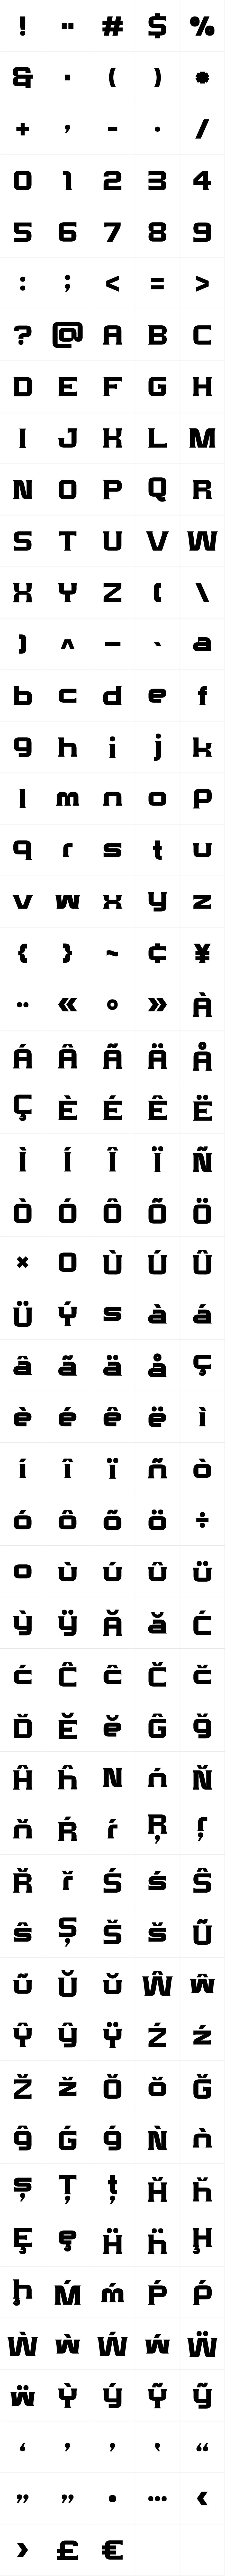 Modernhead Serife Black